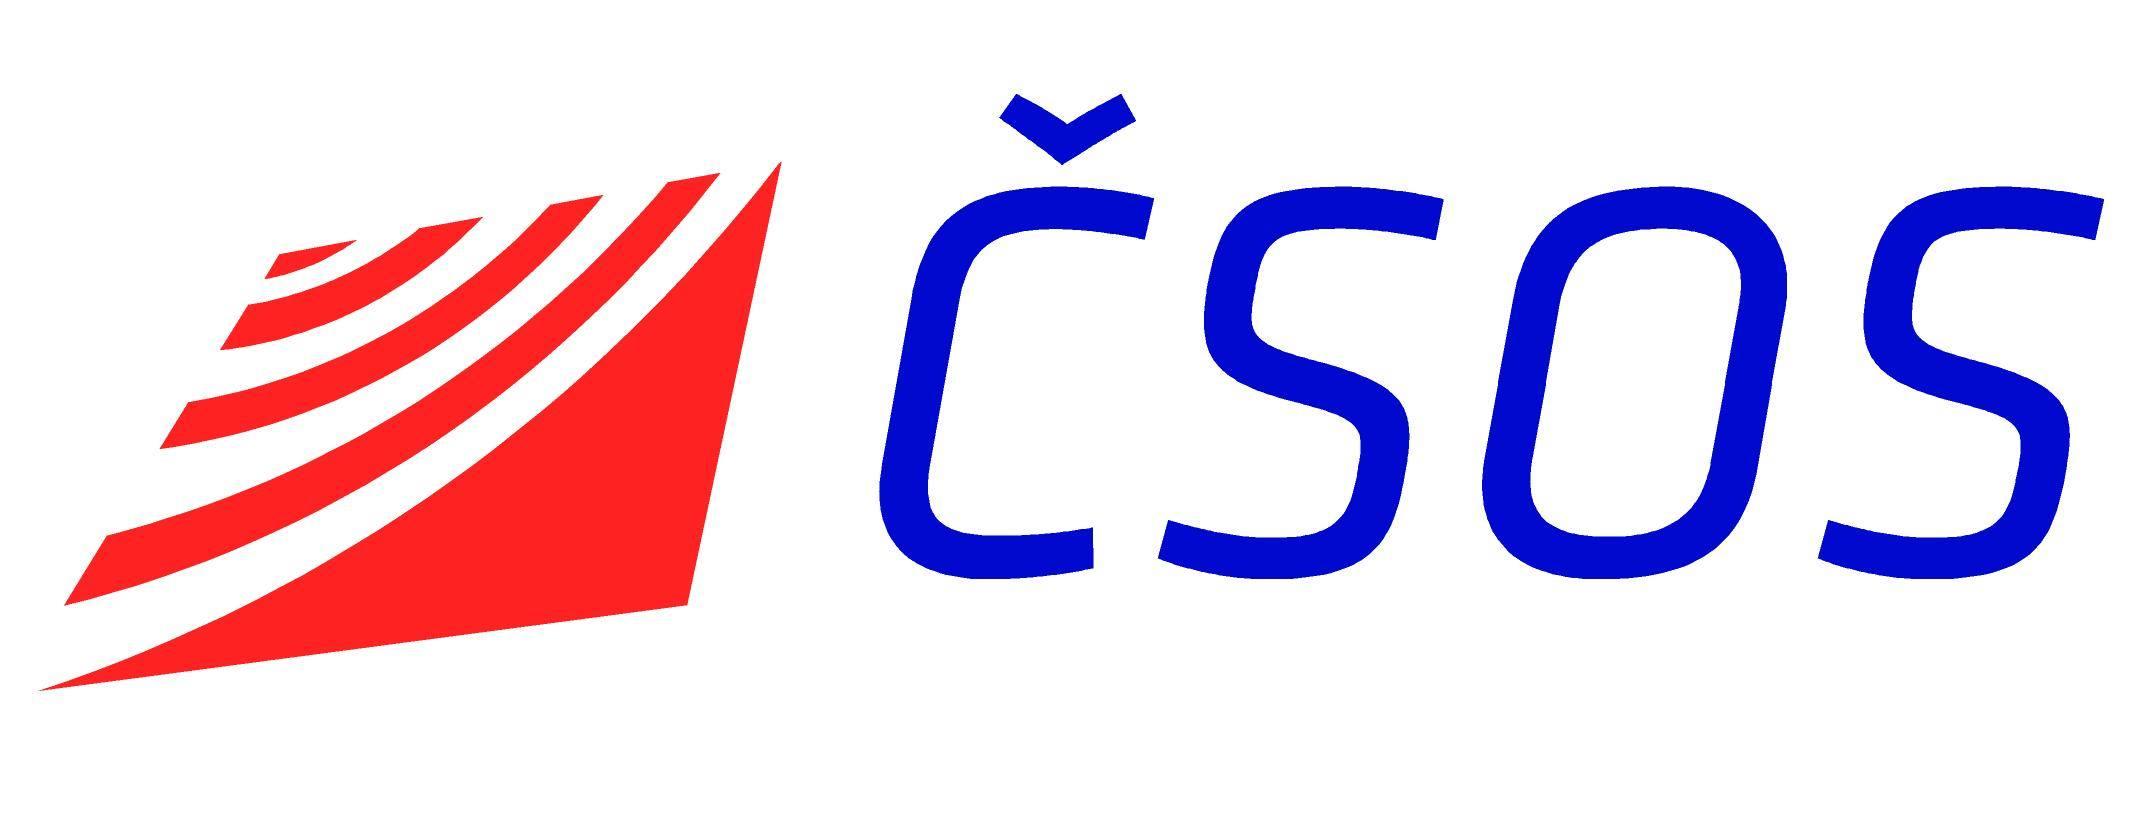 6a987e1d-2f20-11ea-be00-06b4694bee2a%2F1578296720073-csos+logo.jpg